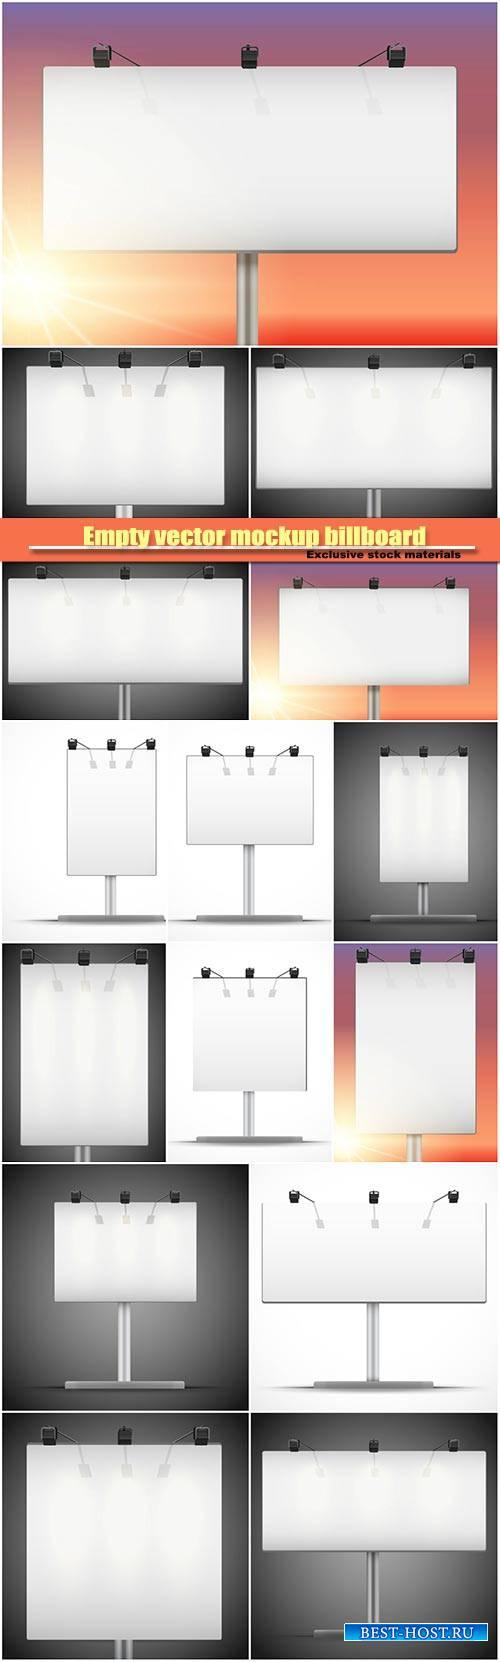 Empty vector mockup billboard with spotlights and illuminated